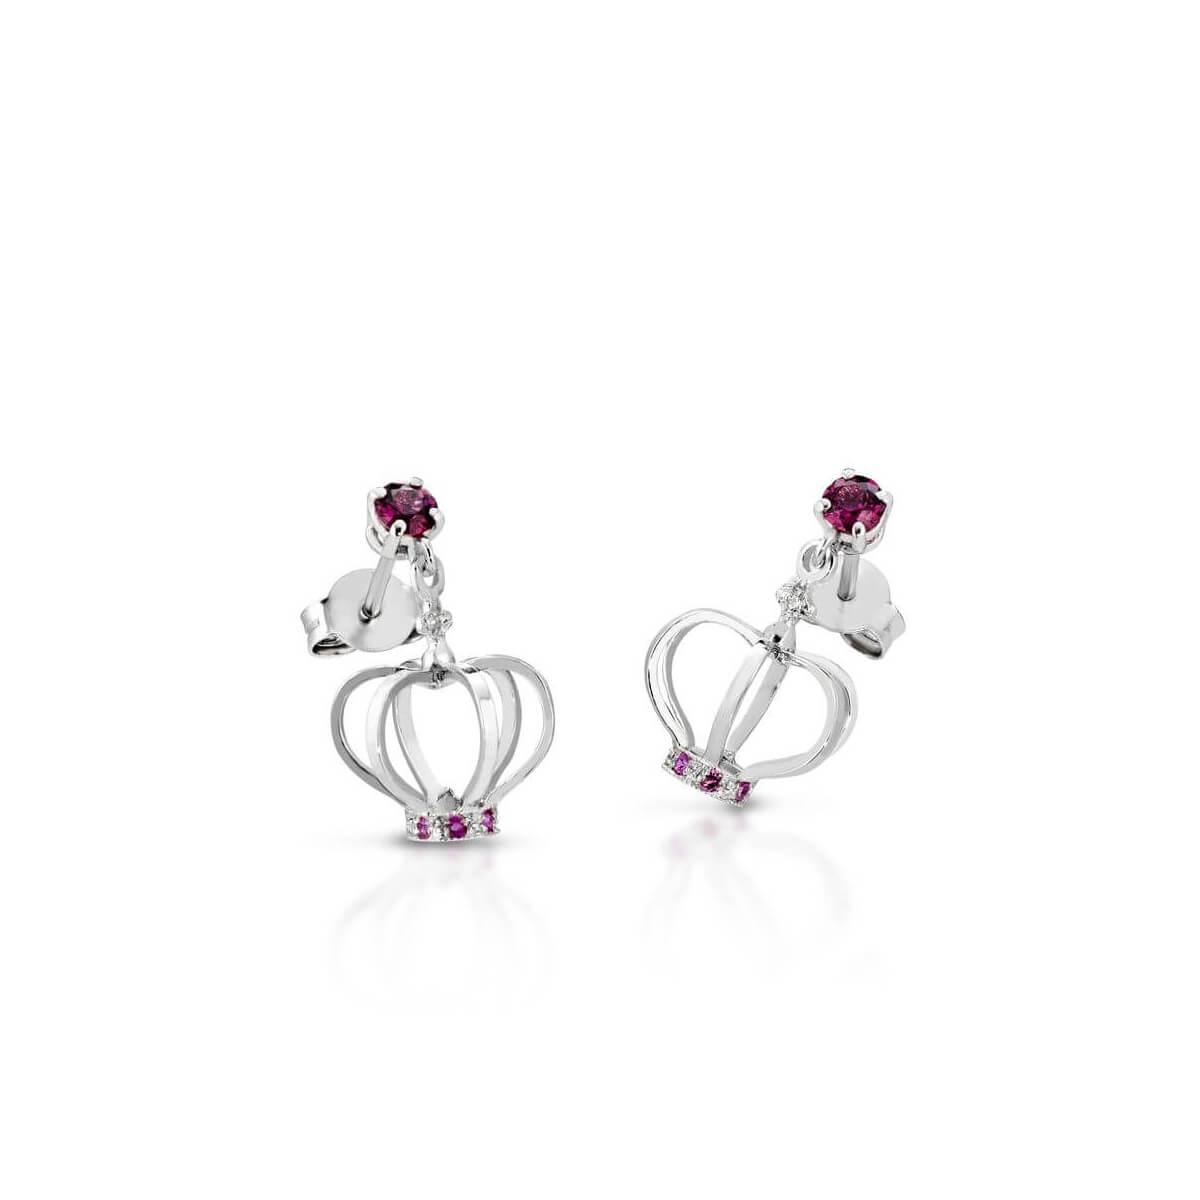 Rhodolite and pink sapphire earrings